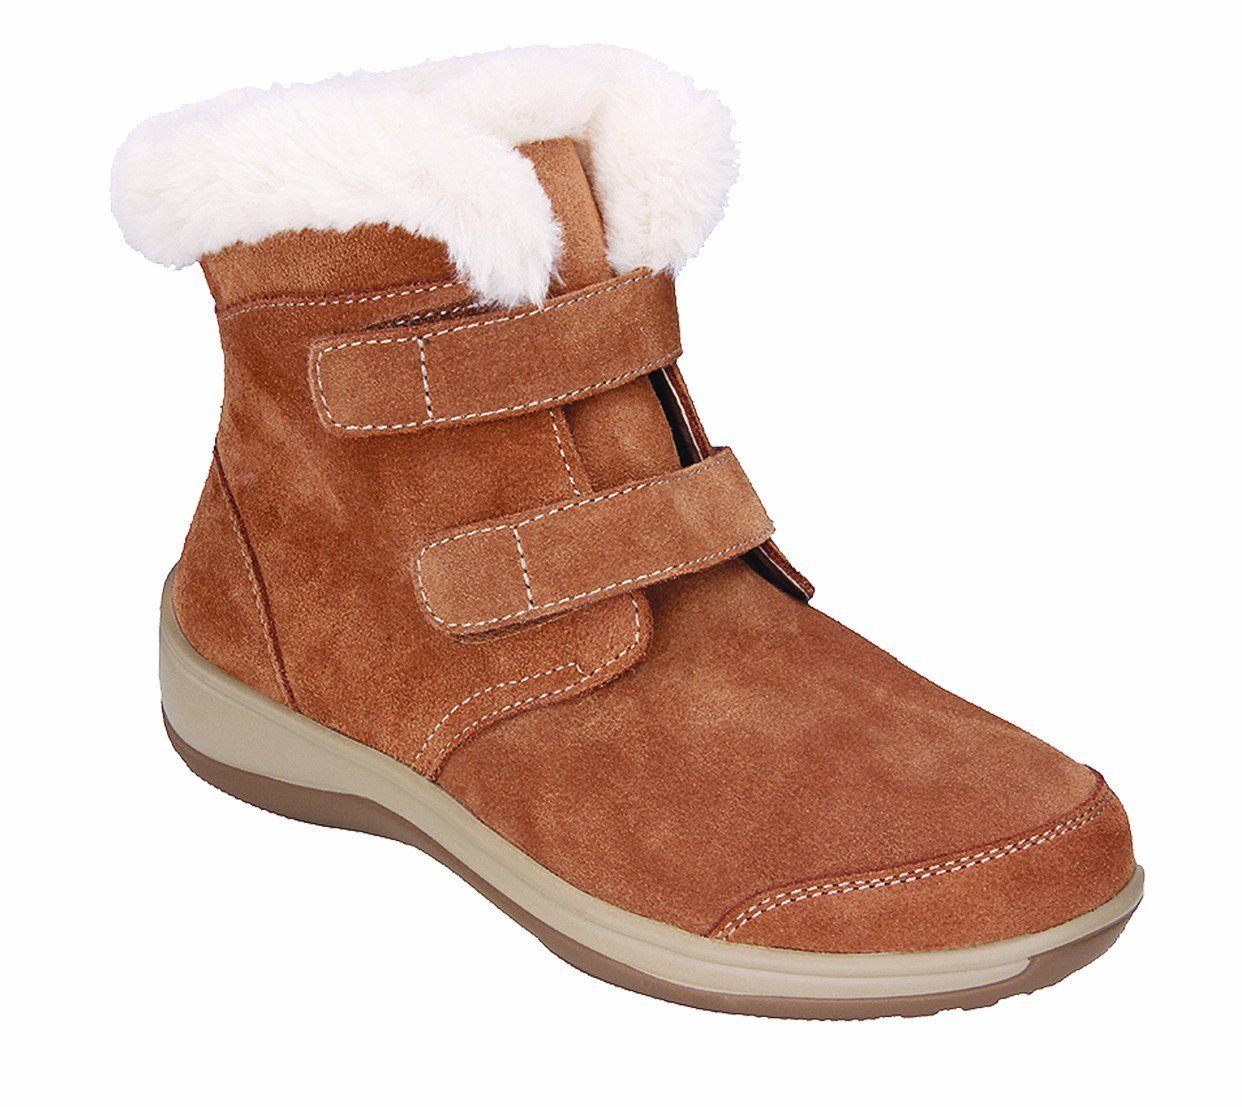 Orthofeet Florence Comfort Heel Pain Flat Feet Plantar Fasciitis Wide Diabetic Orthopedic Women's Boots 8.5 M US